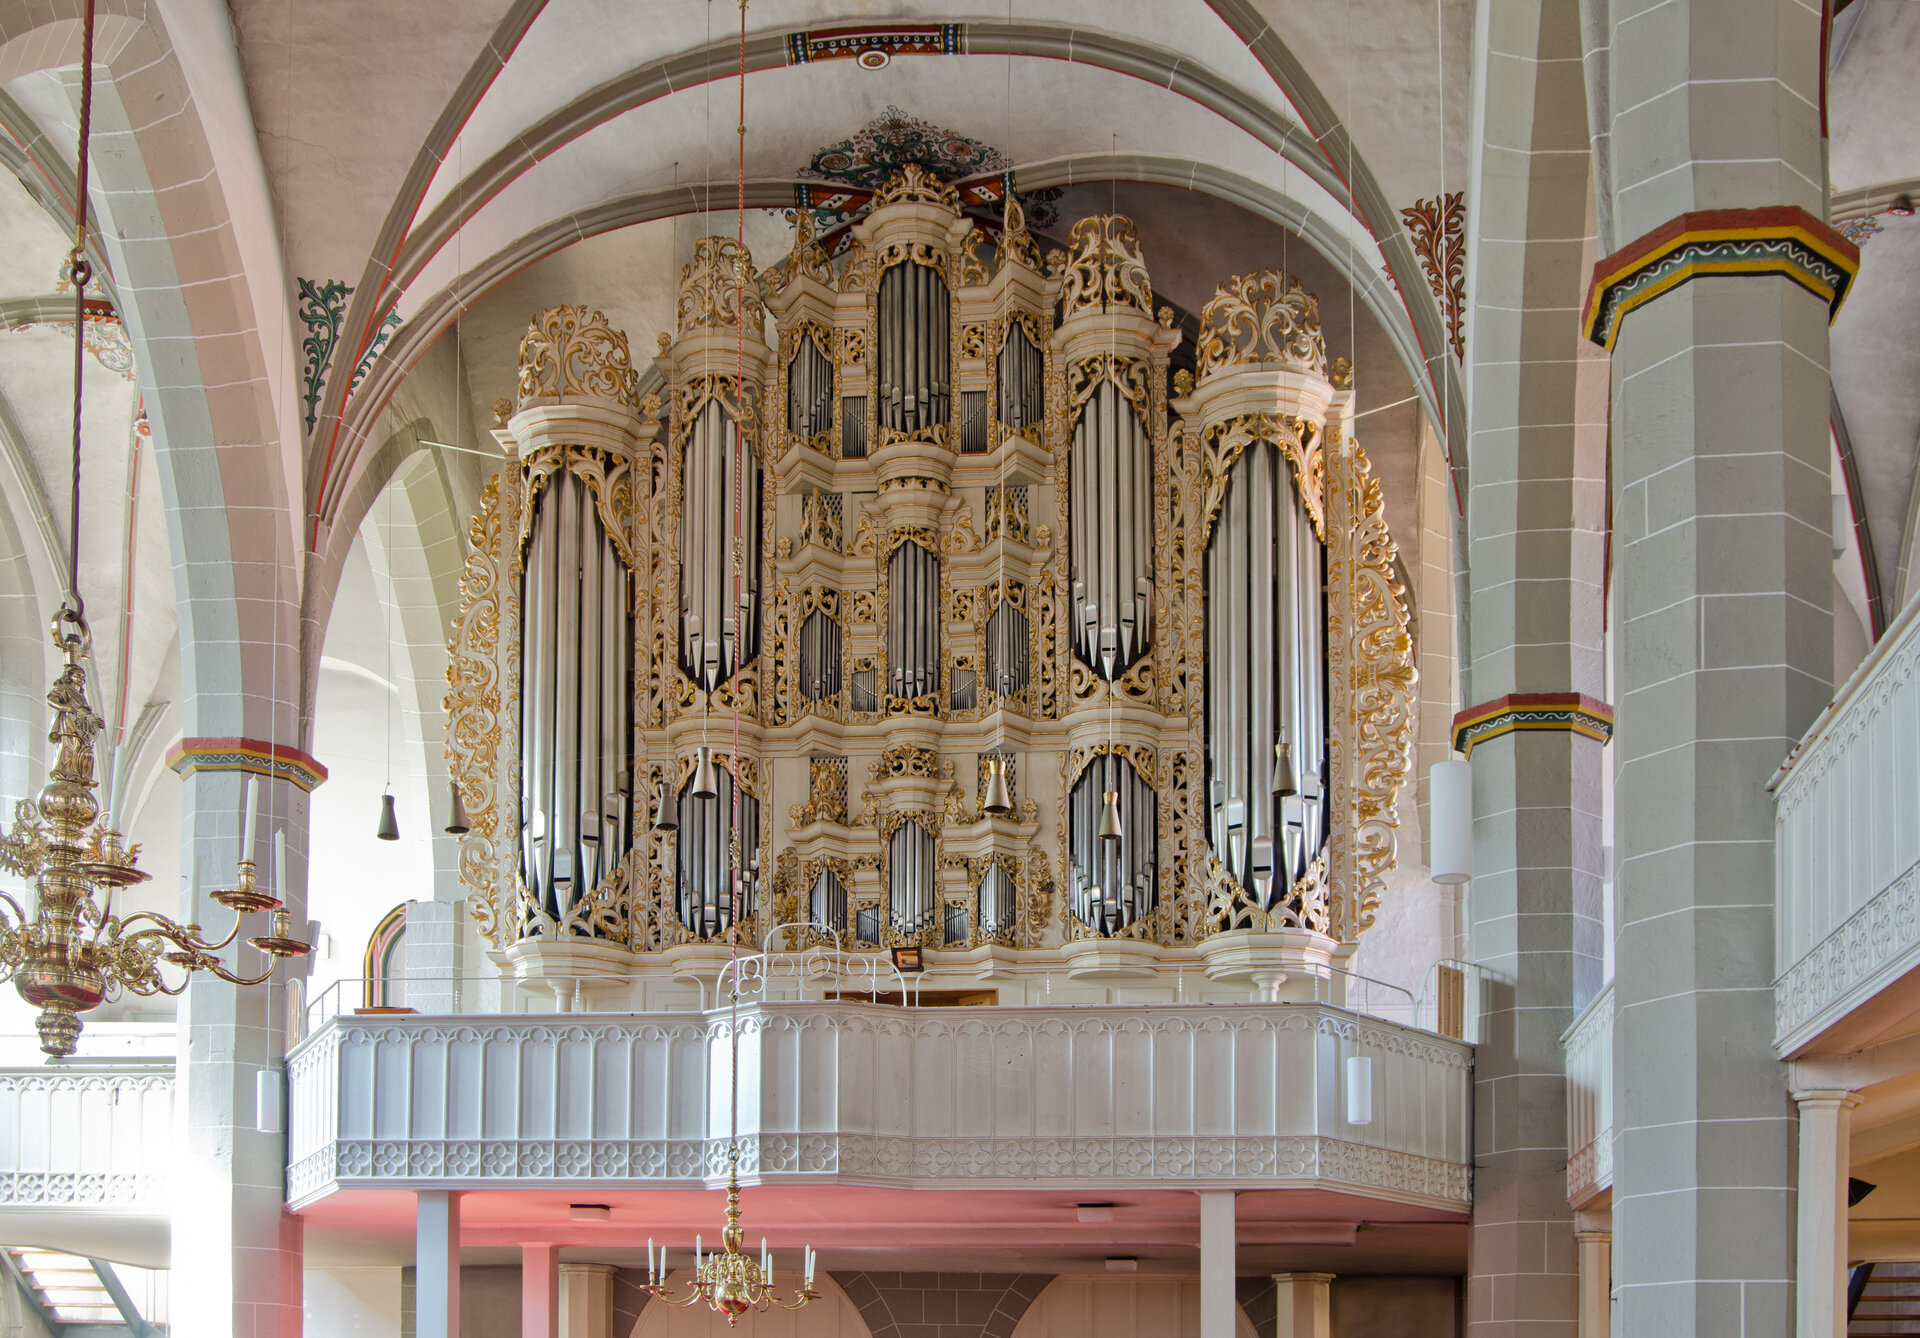 Johann-Hinrich-Gloger-Orgel 1721